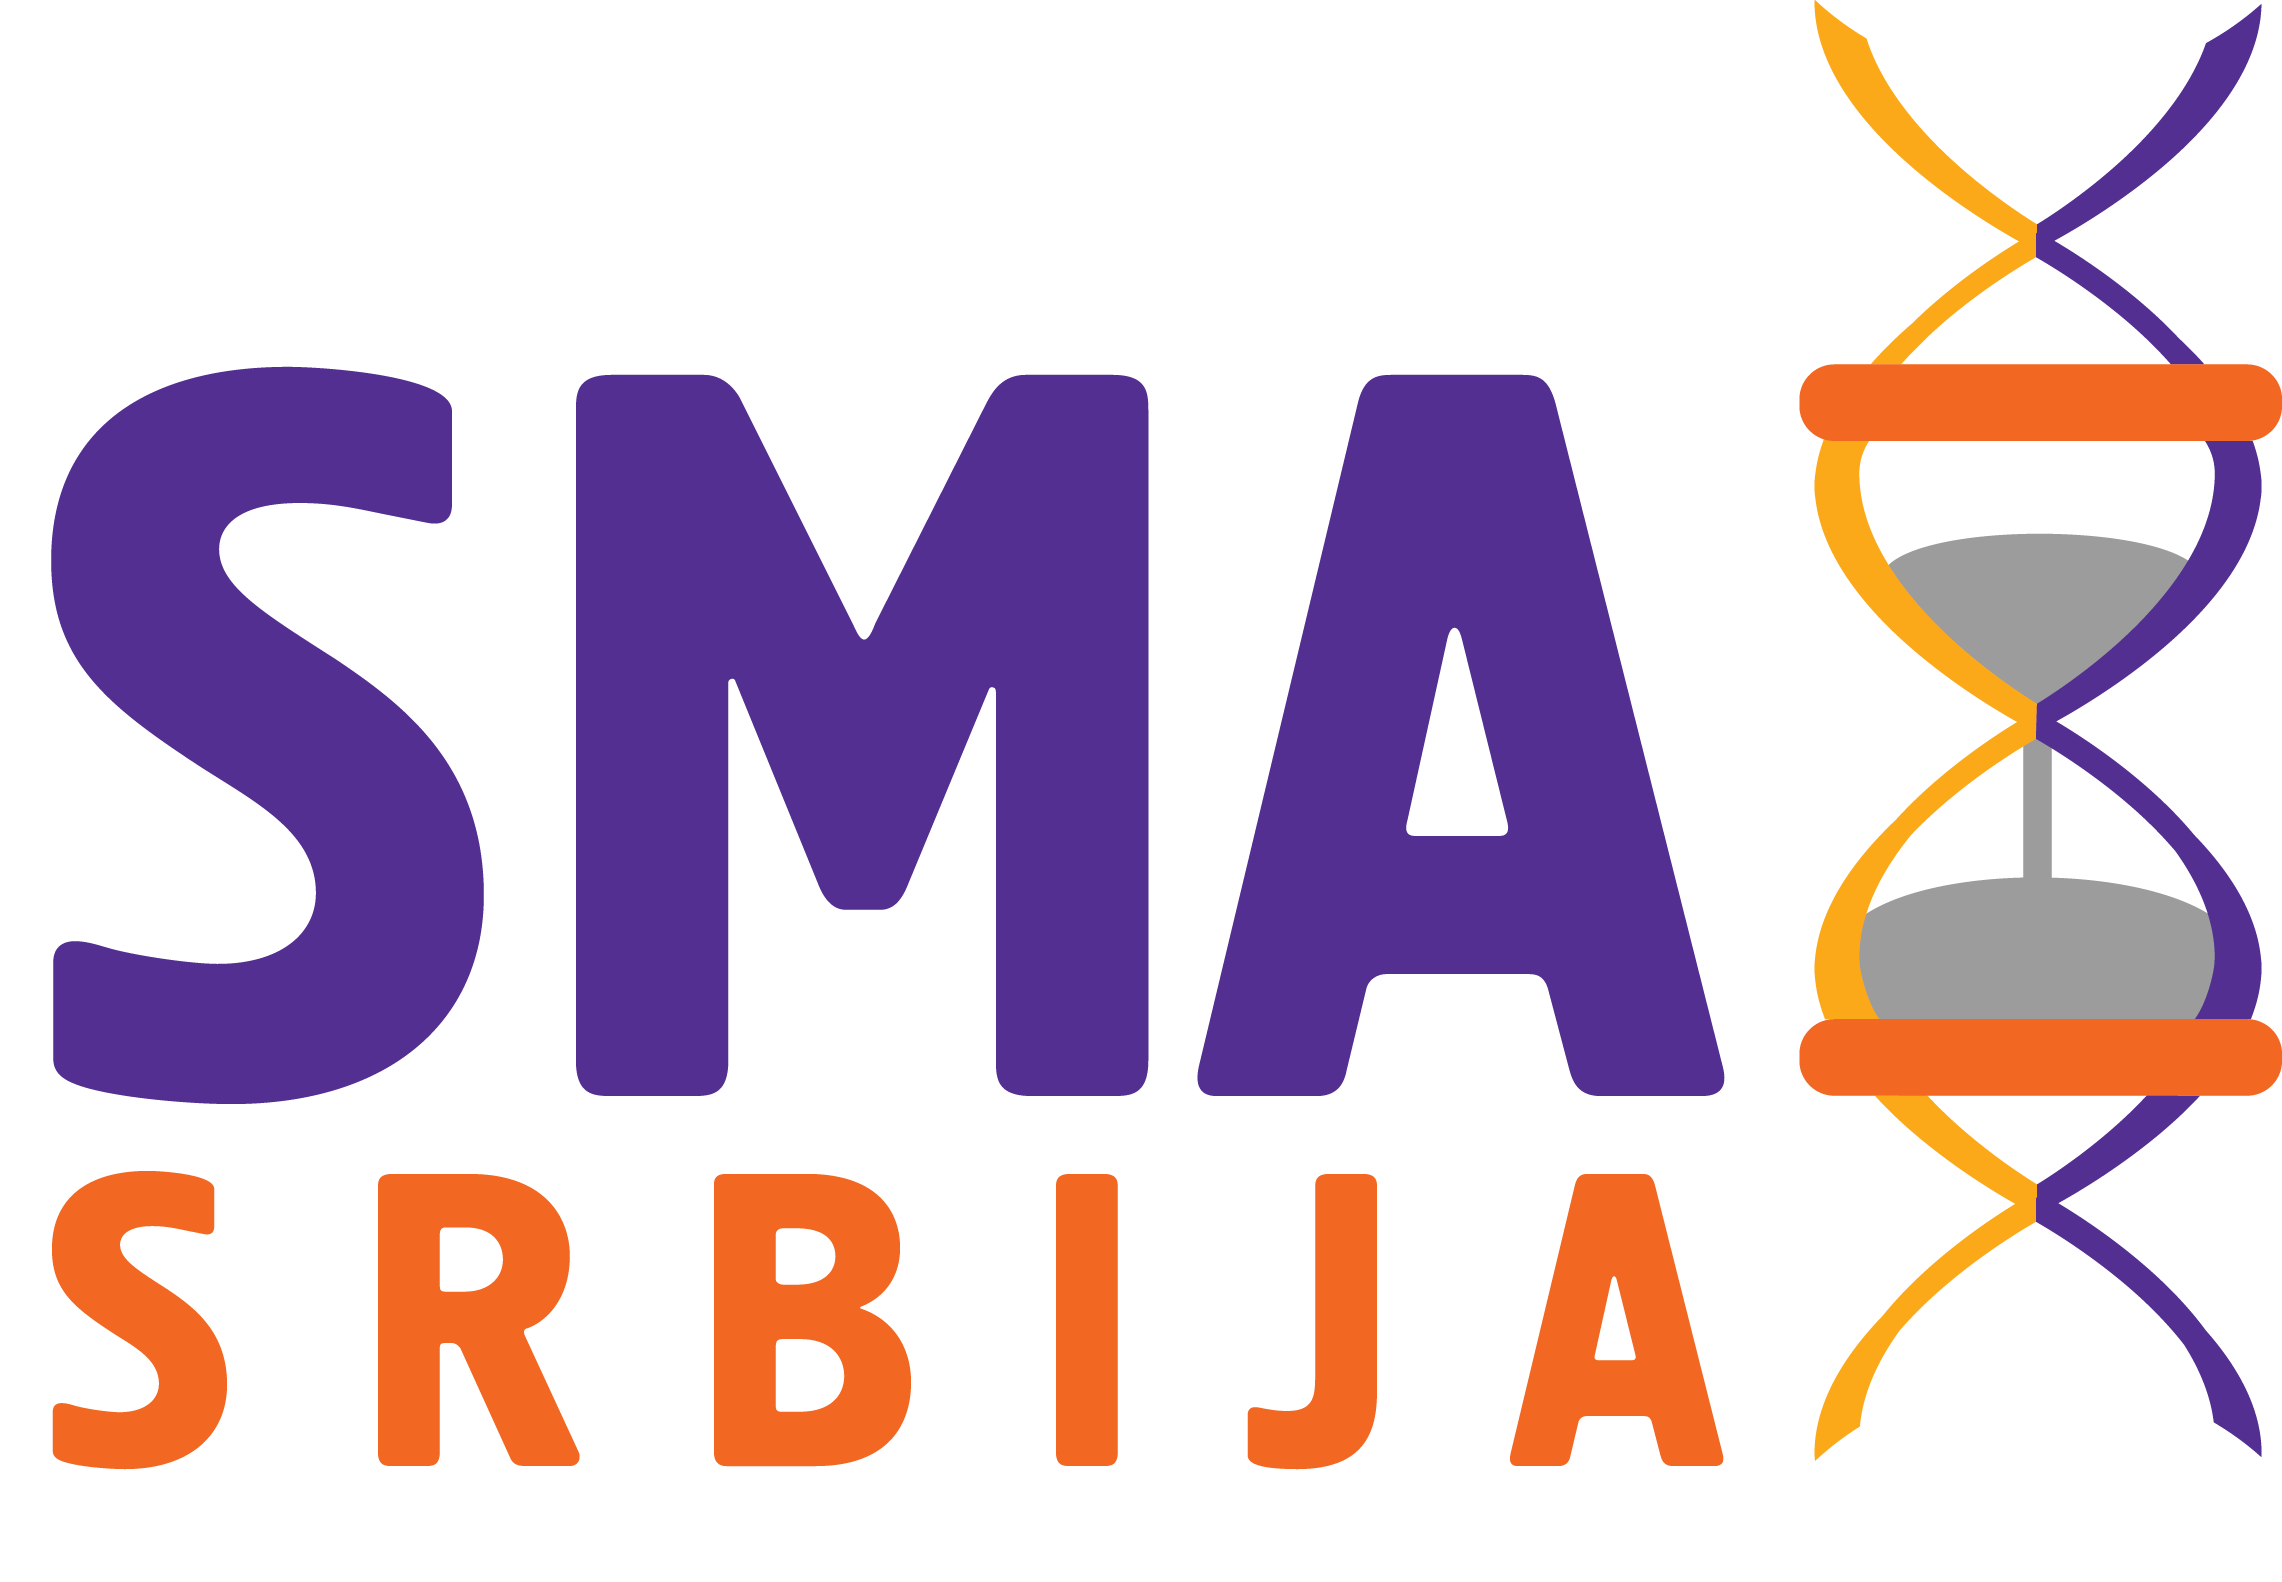 SMA Srbija